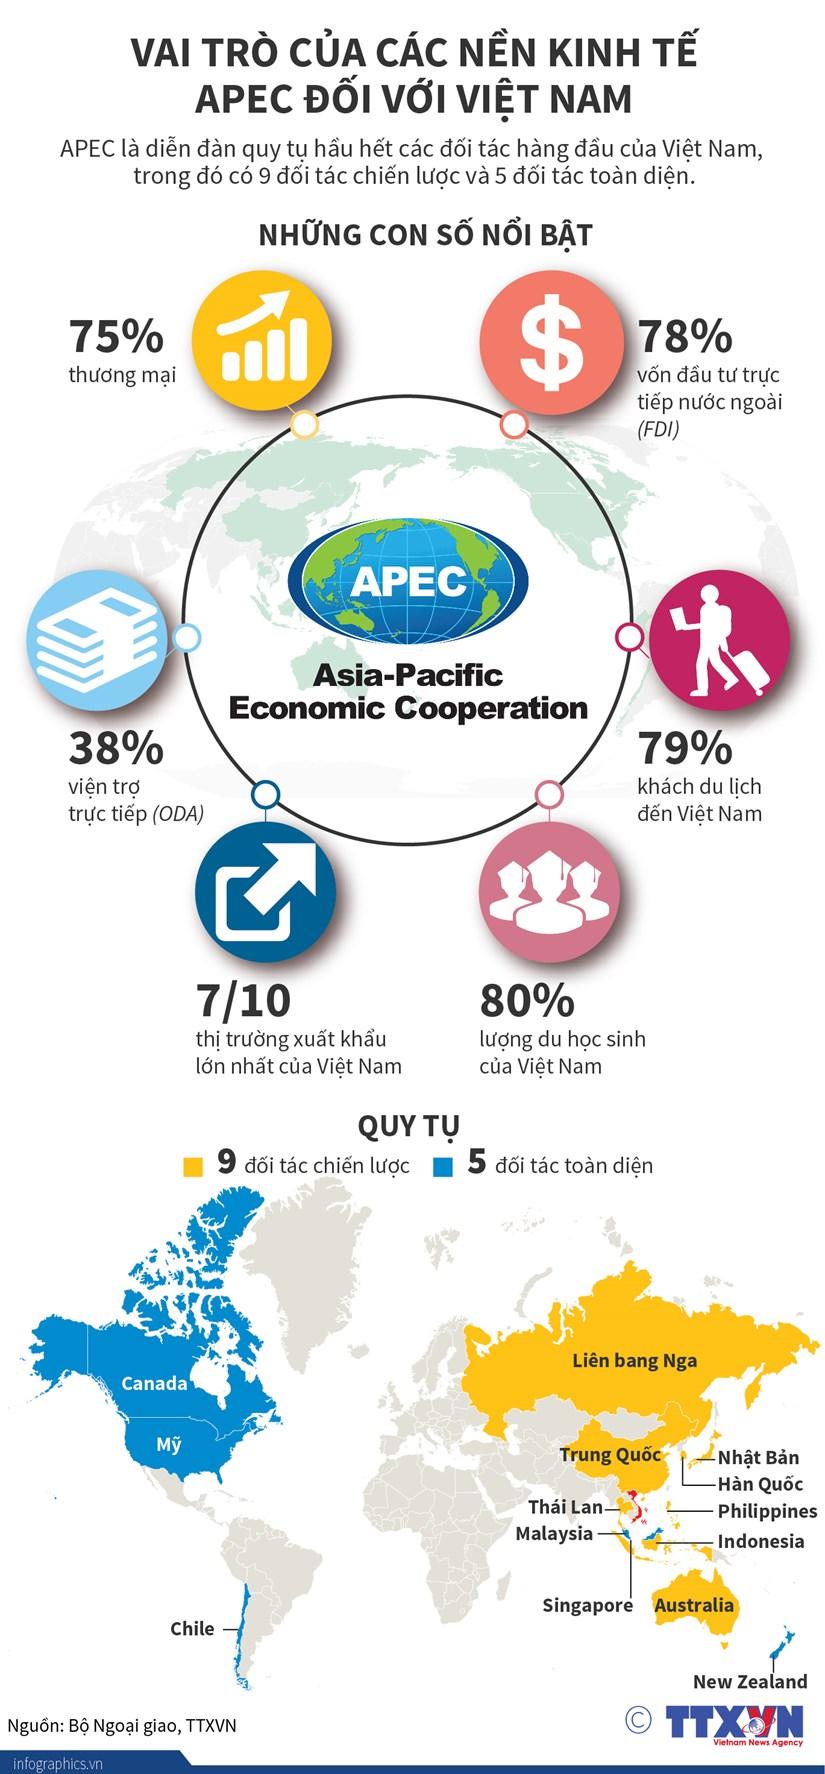 [Infographics] Vai tro cua cac nen kinh te APEC doi voi Viet Nam hinh anh 1